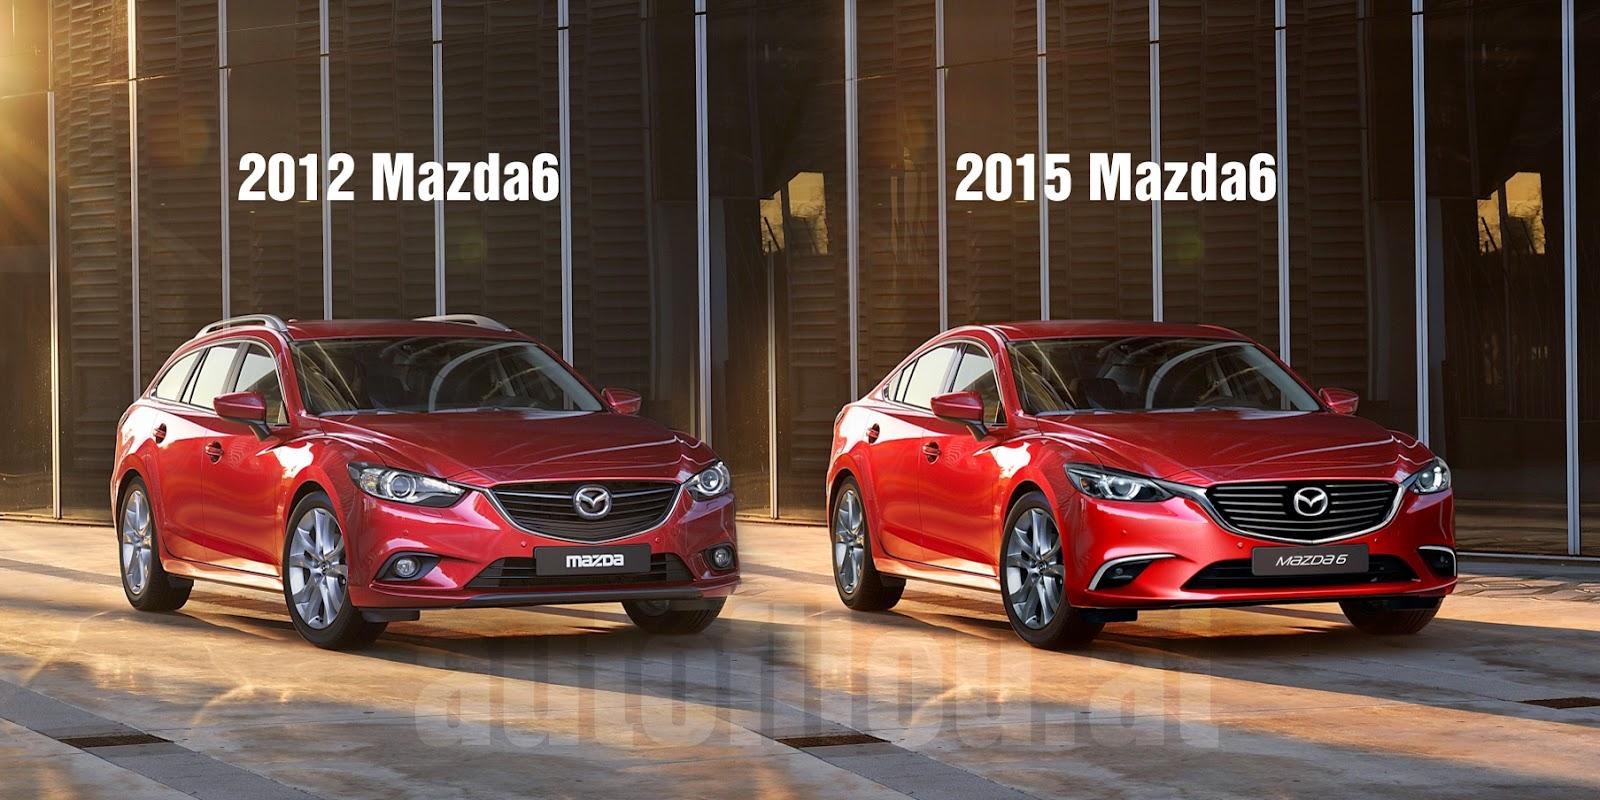 2012 - [Mazda] 6 III - Page 14 001-2012-vs-2015-Mazda6-Mazda-6-autofilou